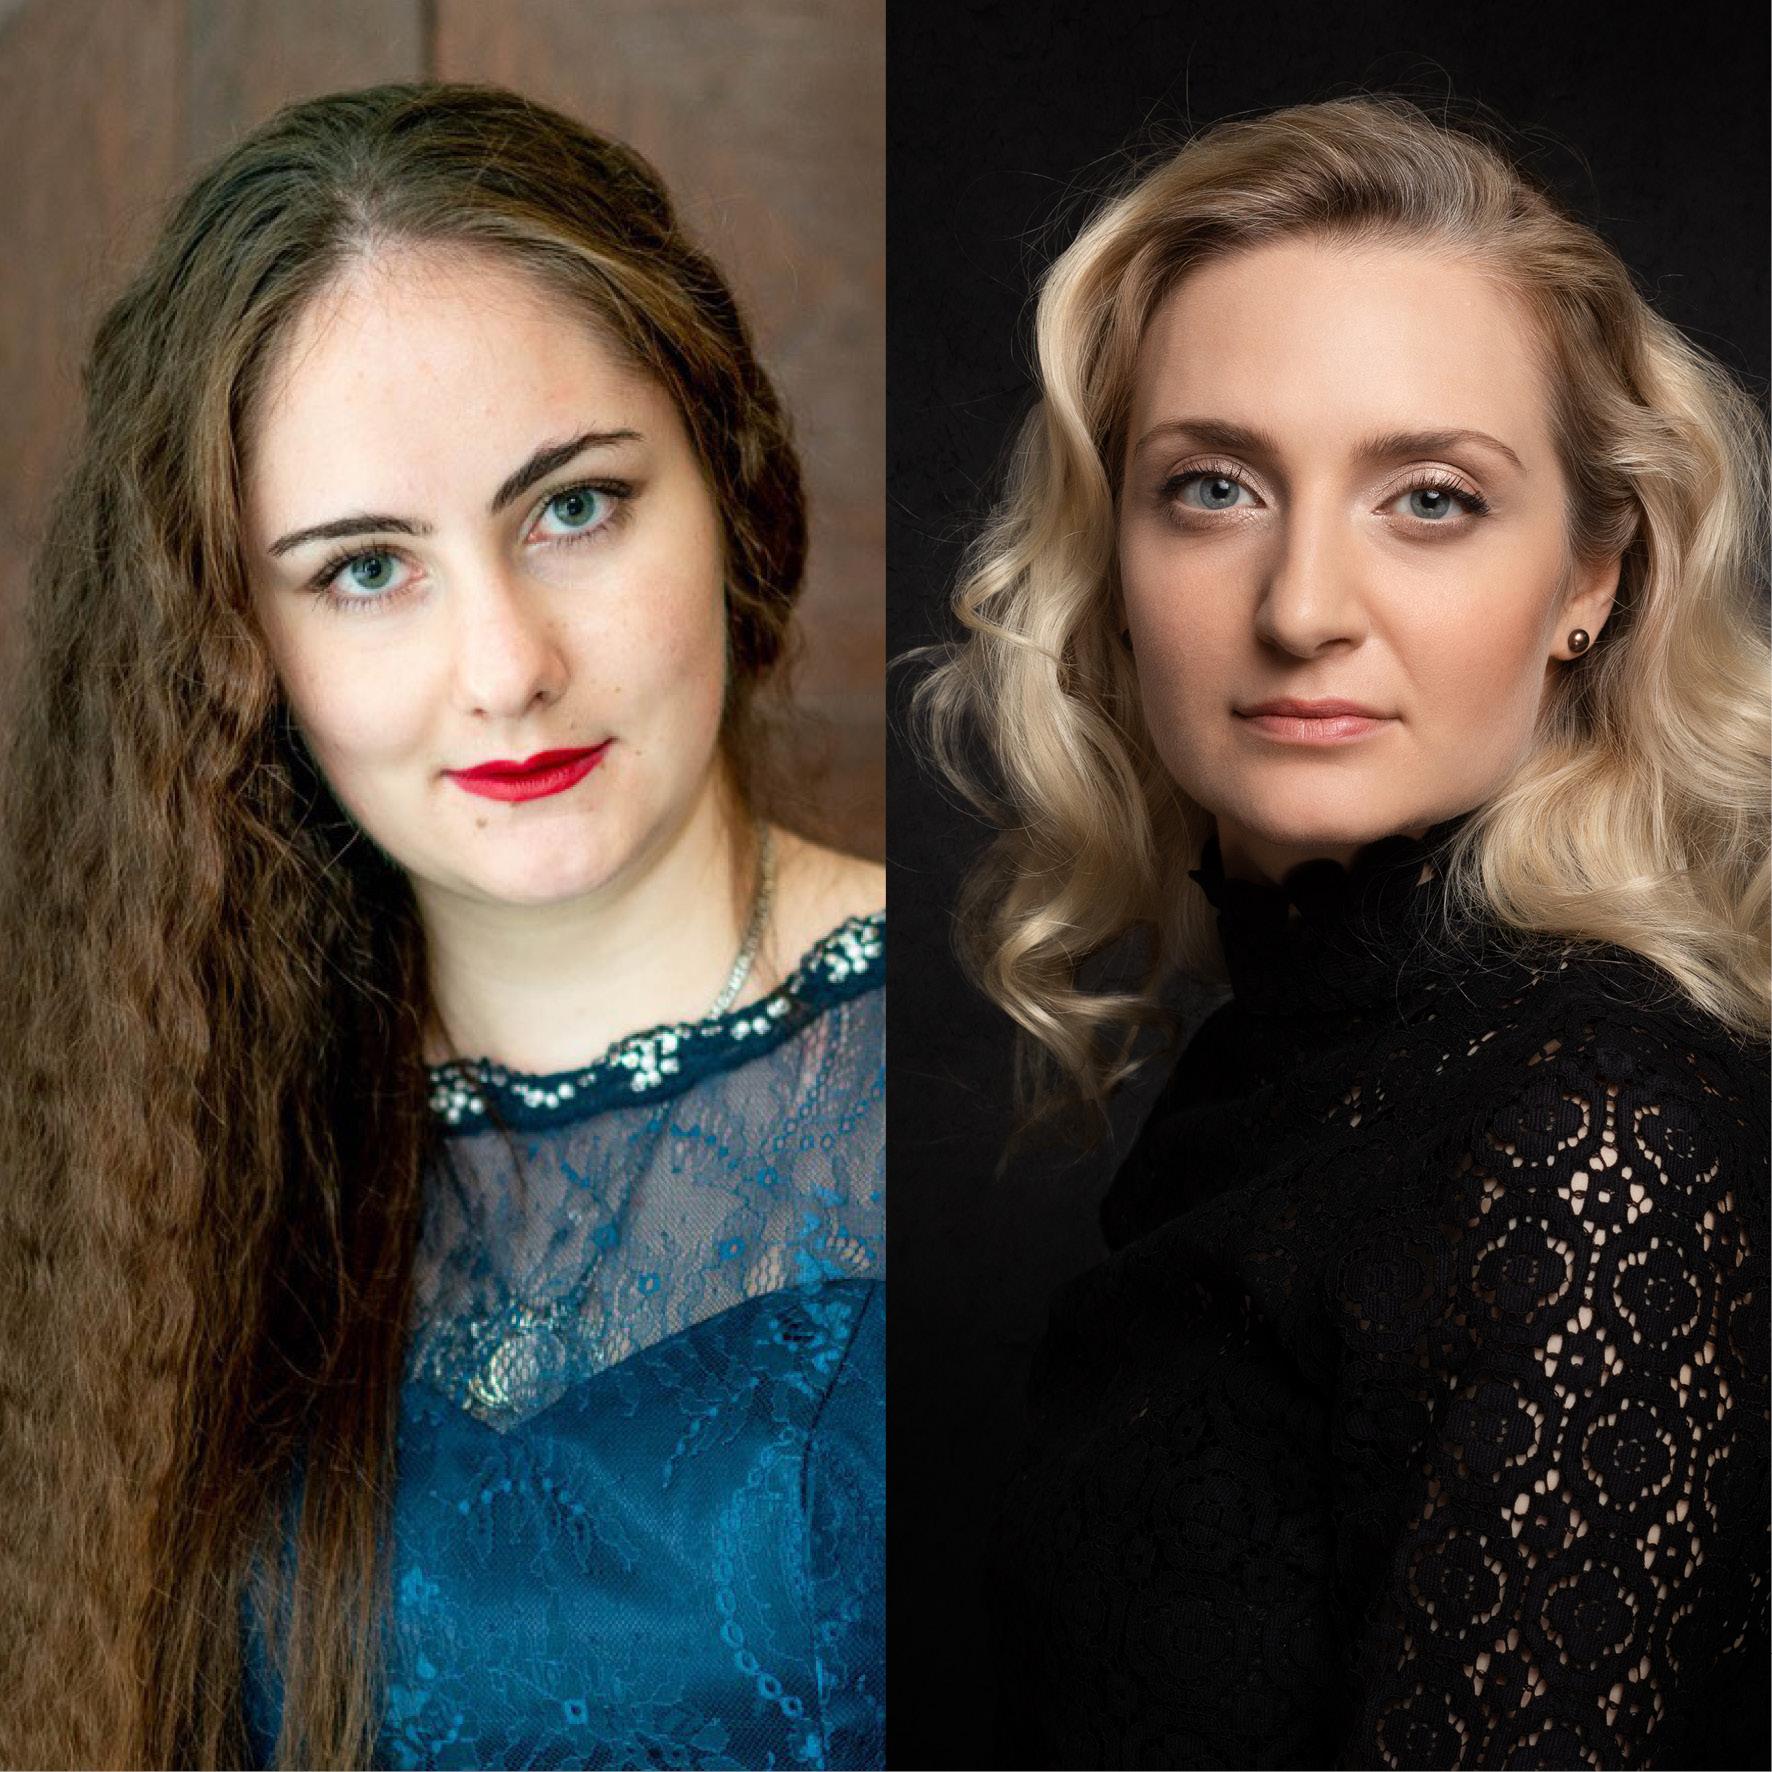 Duo 6: Ekaterina Chayka-Rubinstein / Maria Yulin